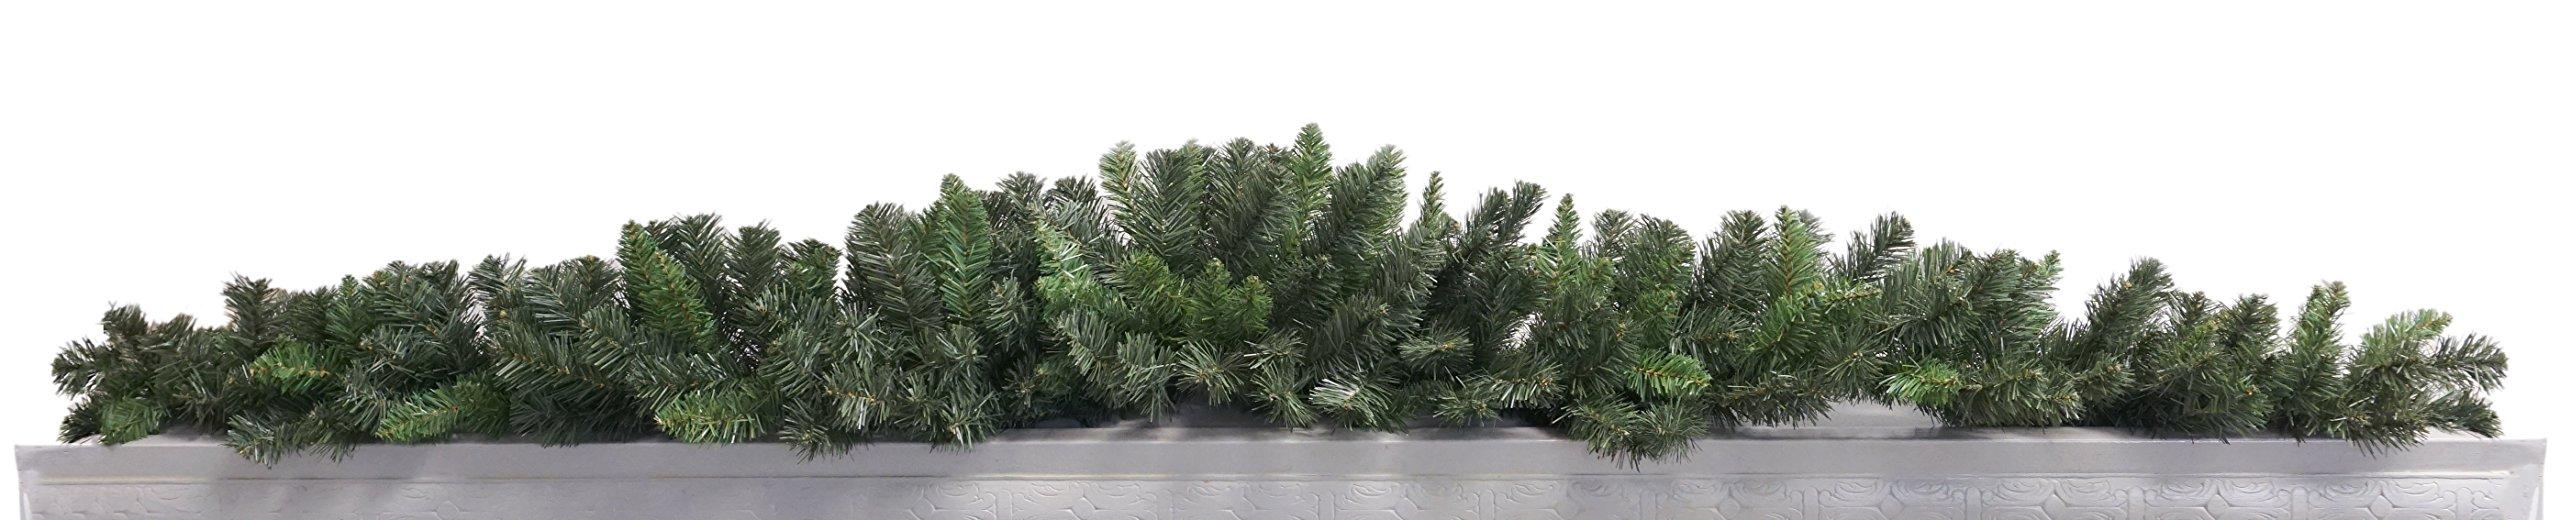 Artificial Pine Christmas Mantel Swag Garland - 6'